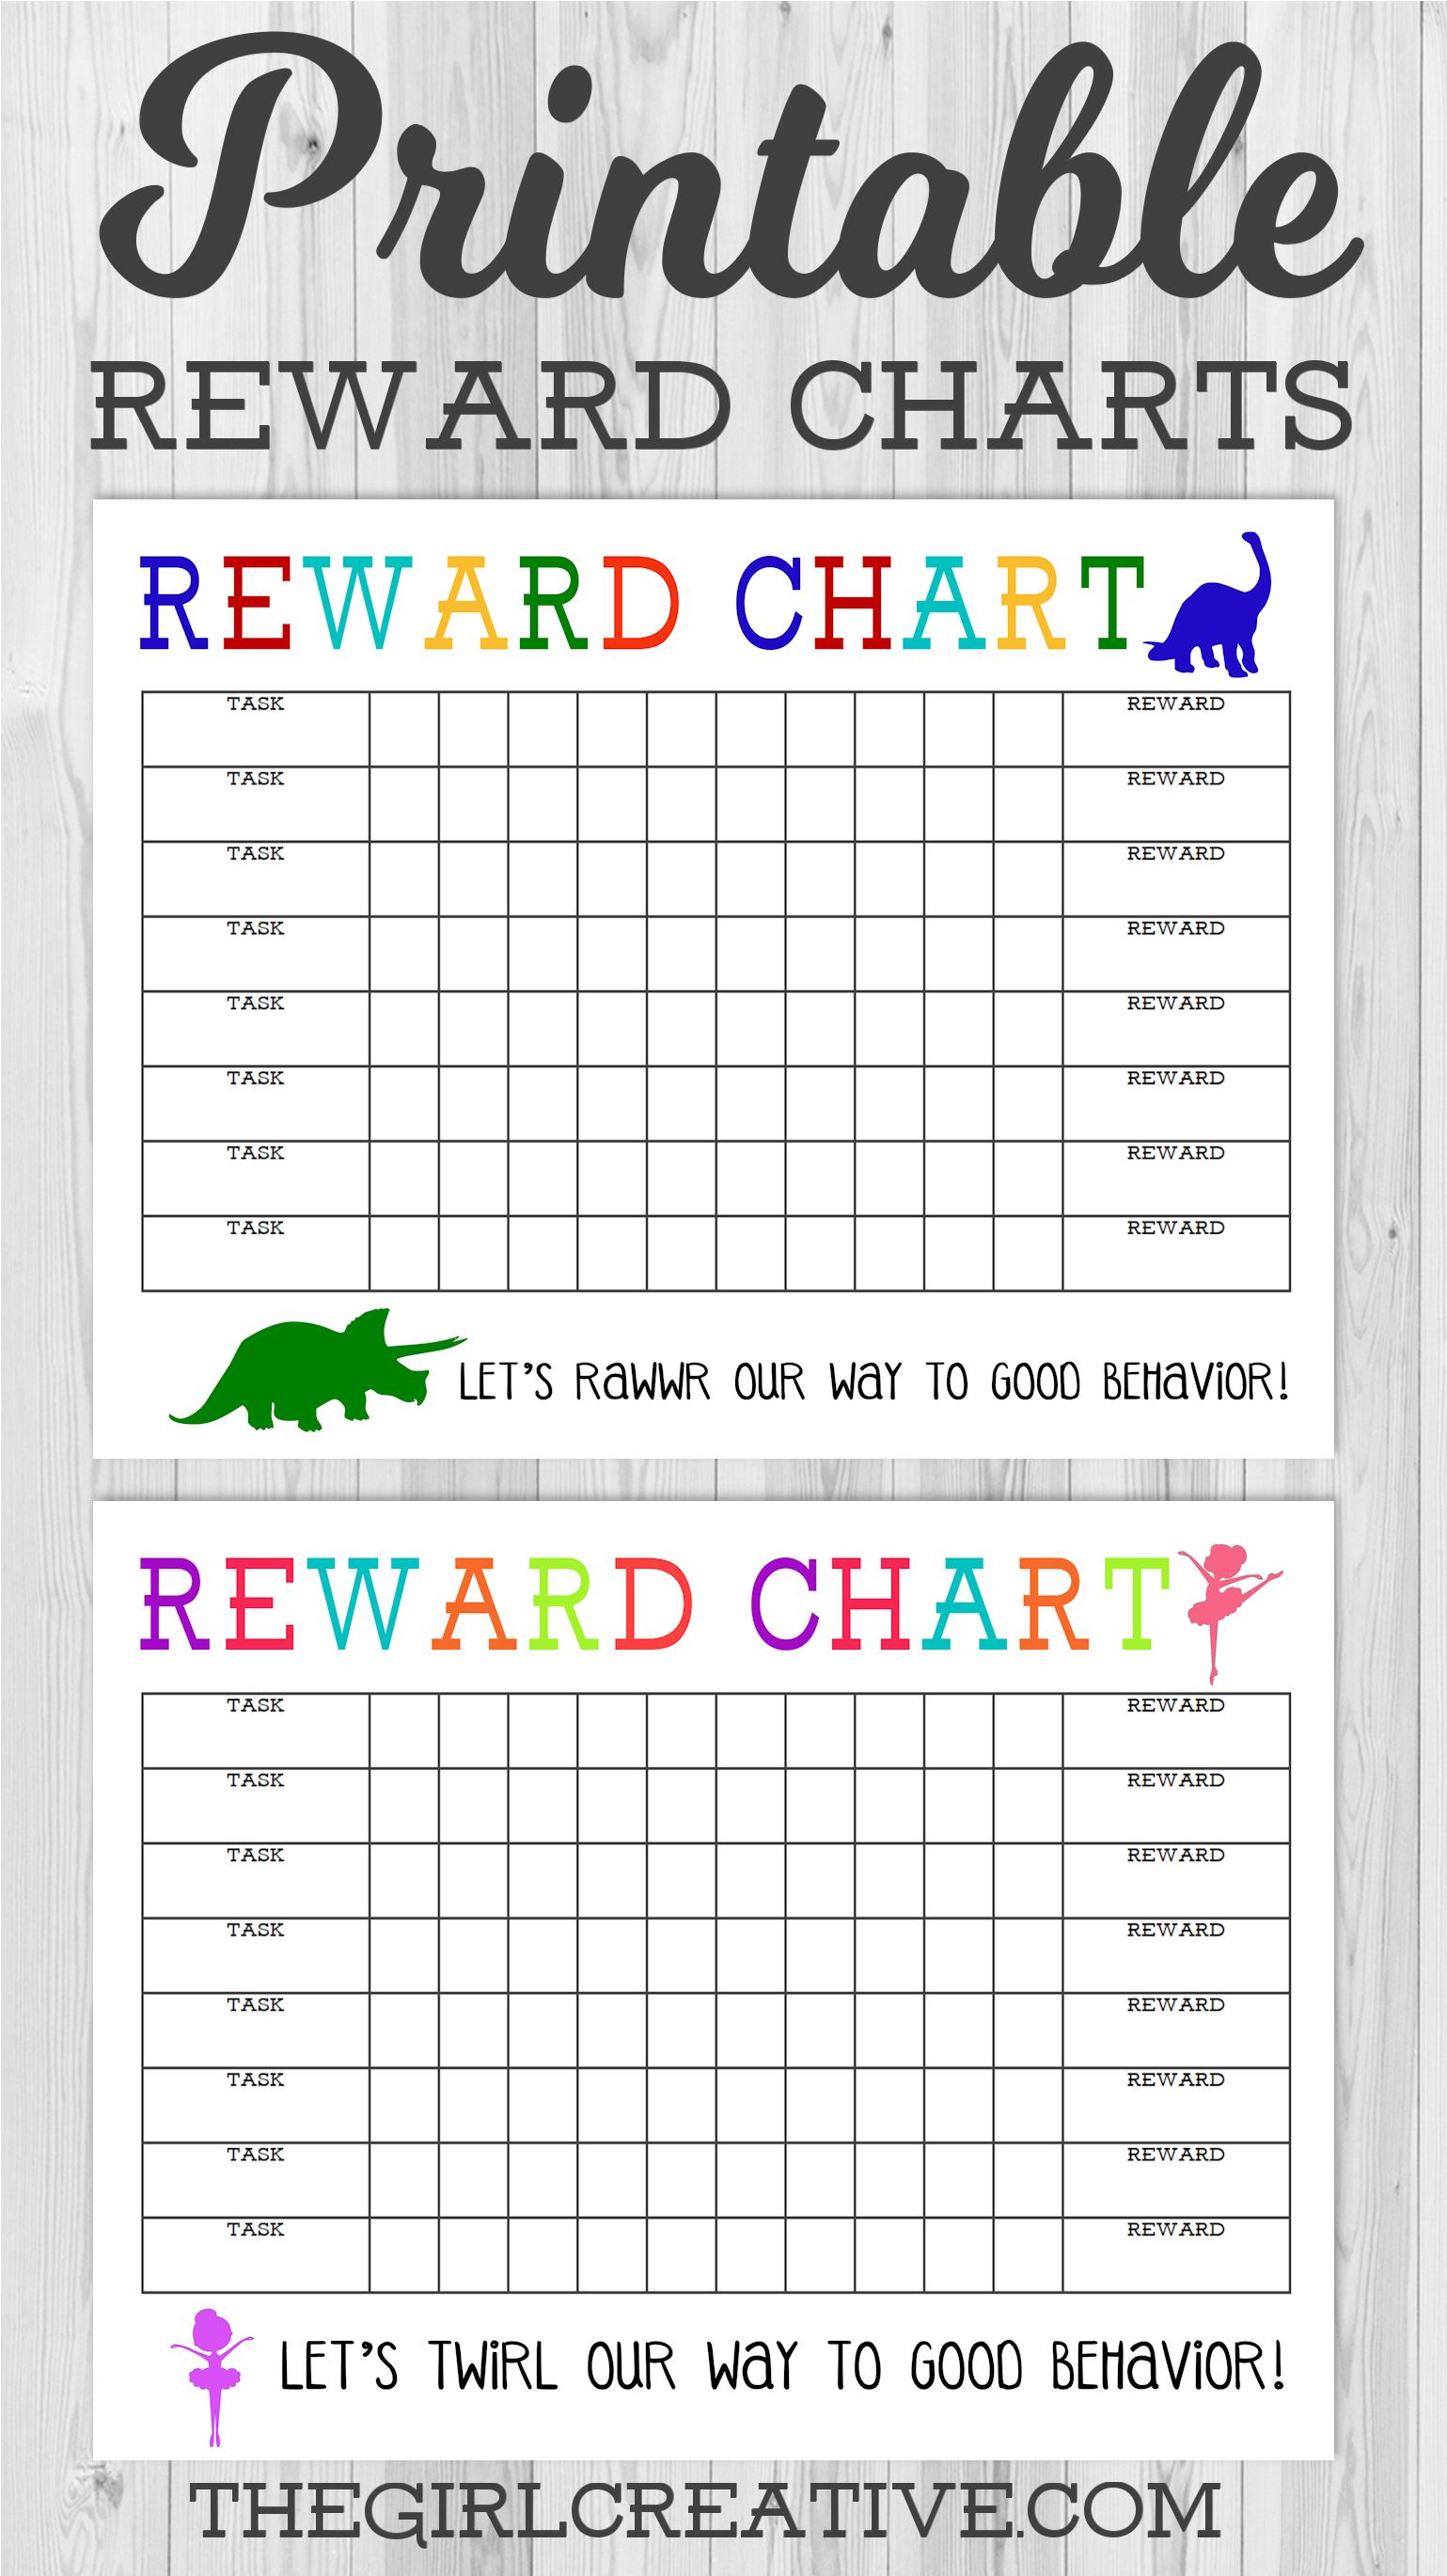 Printable Reward Chart - The Girl Creative - Free Printable Incentive Charts For School